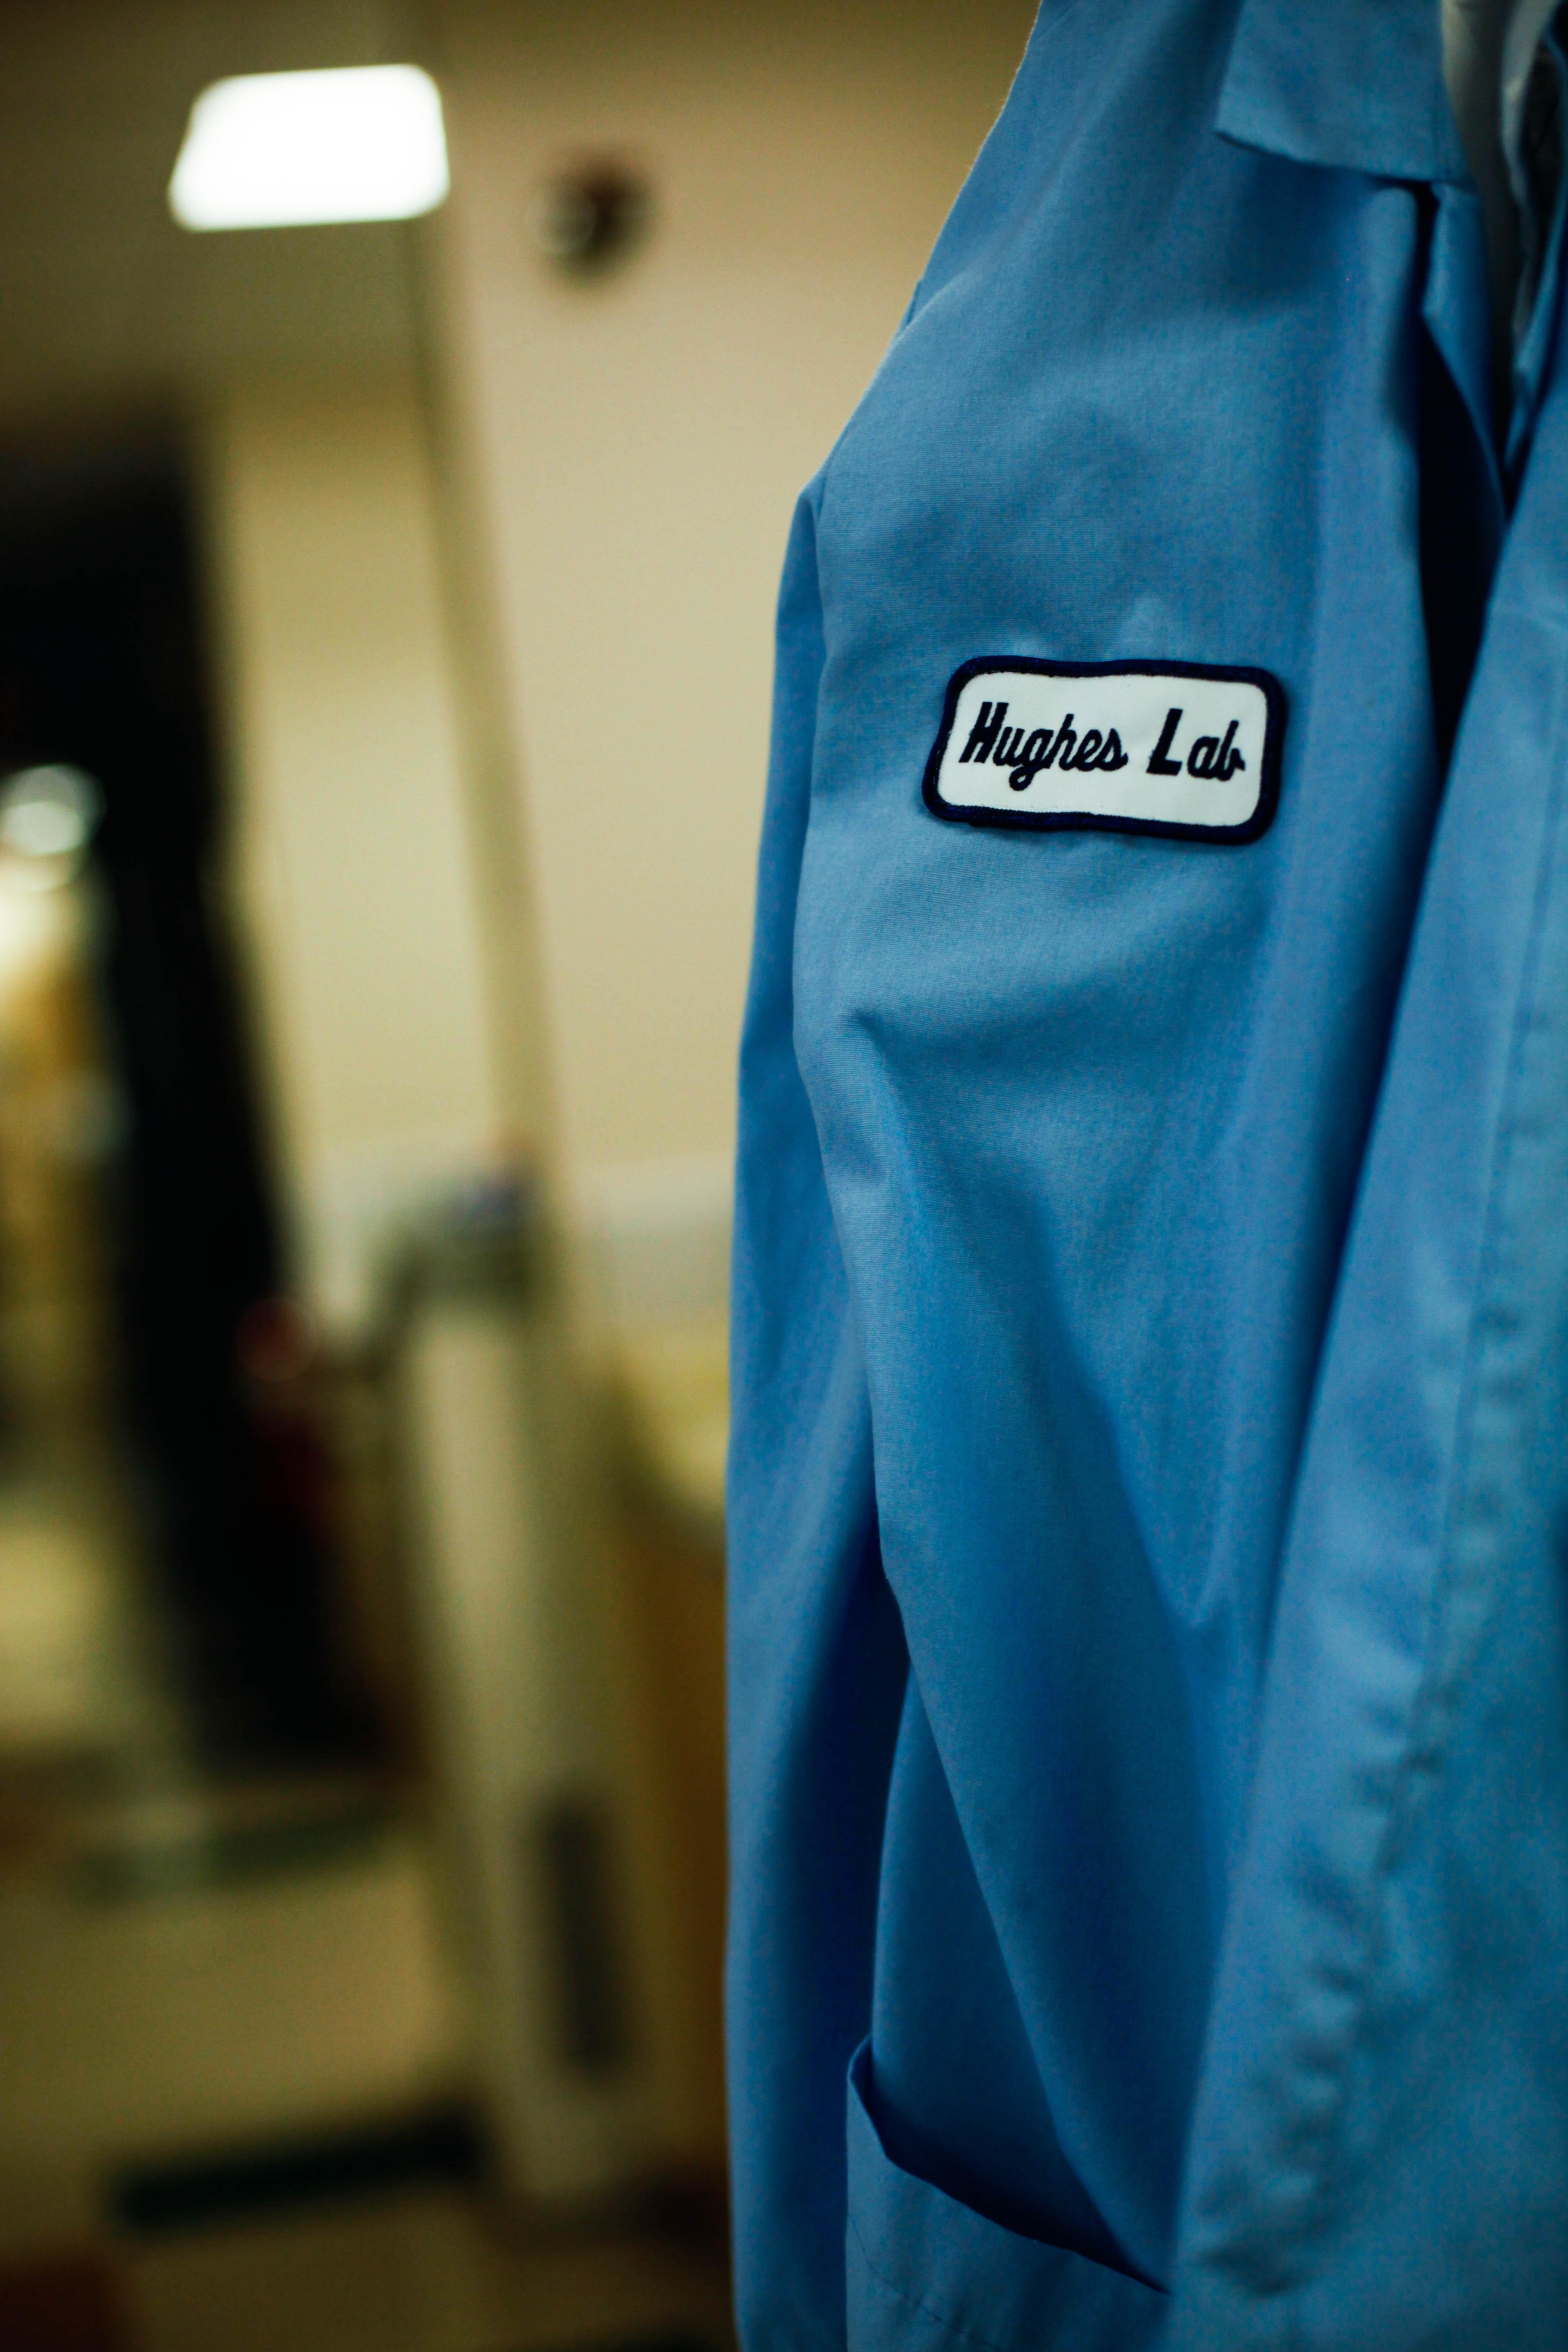 Hughes Lab